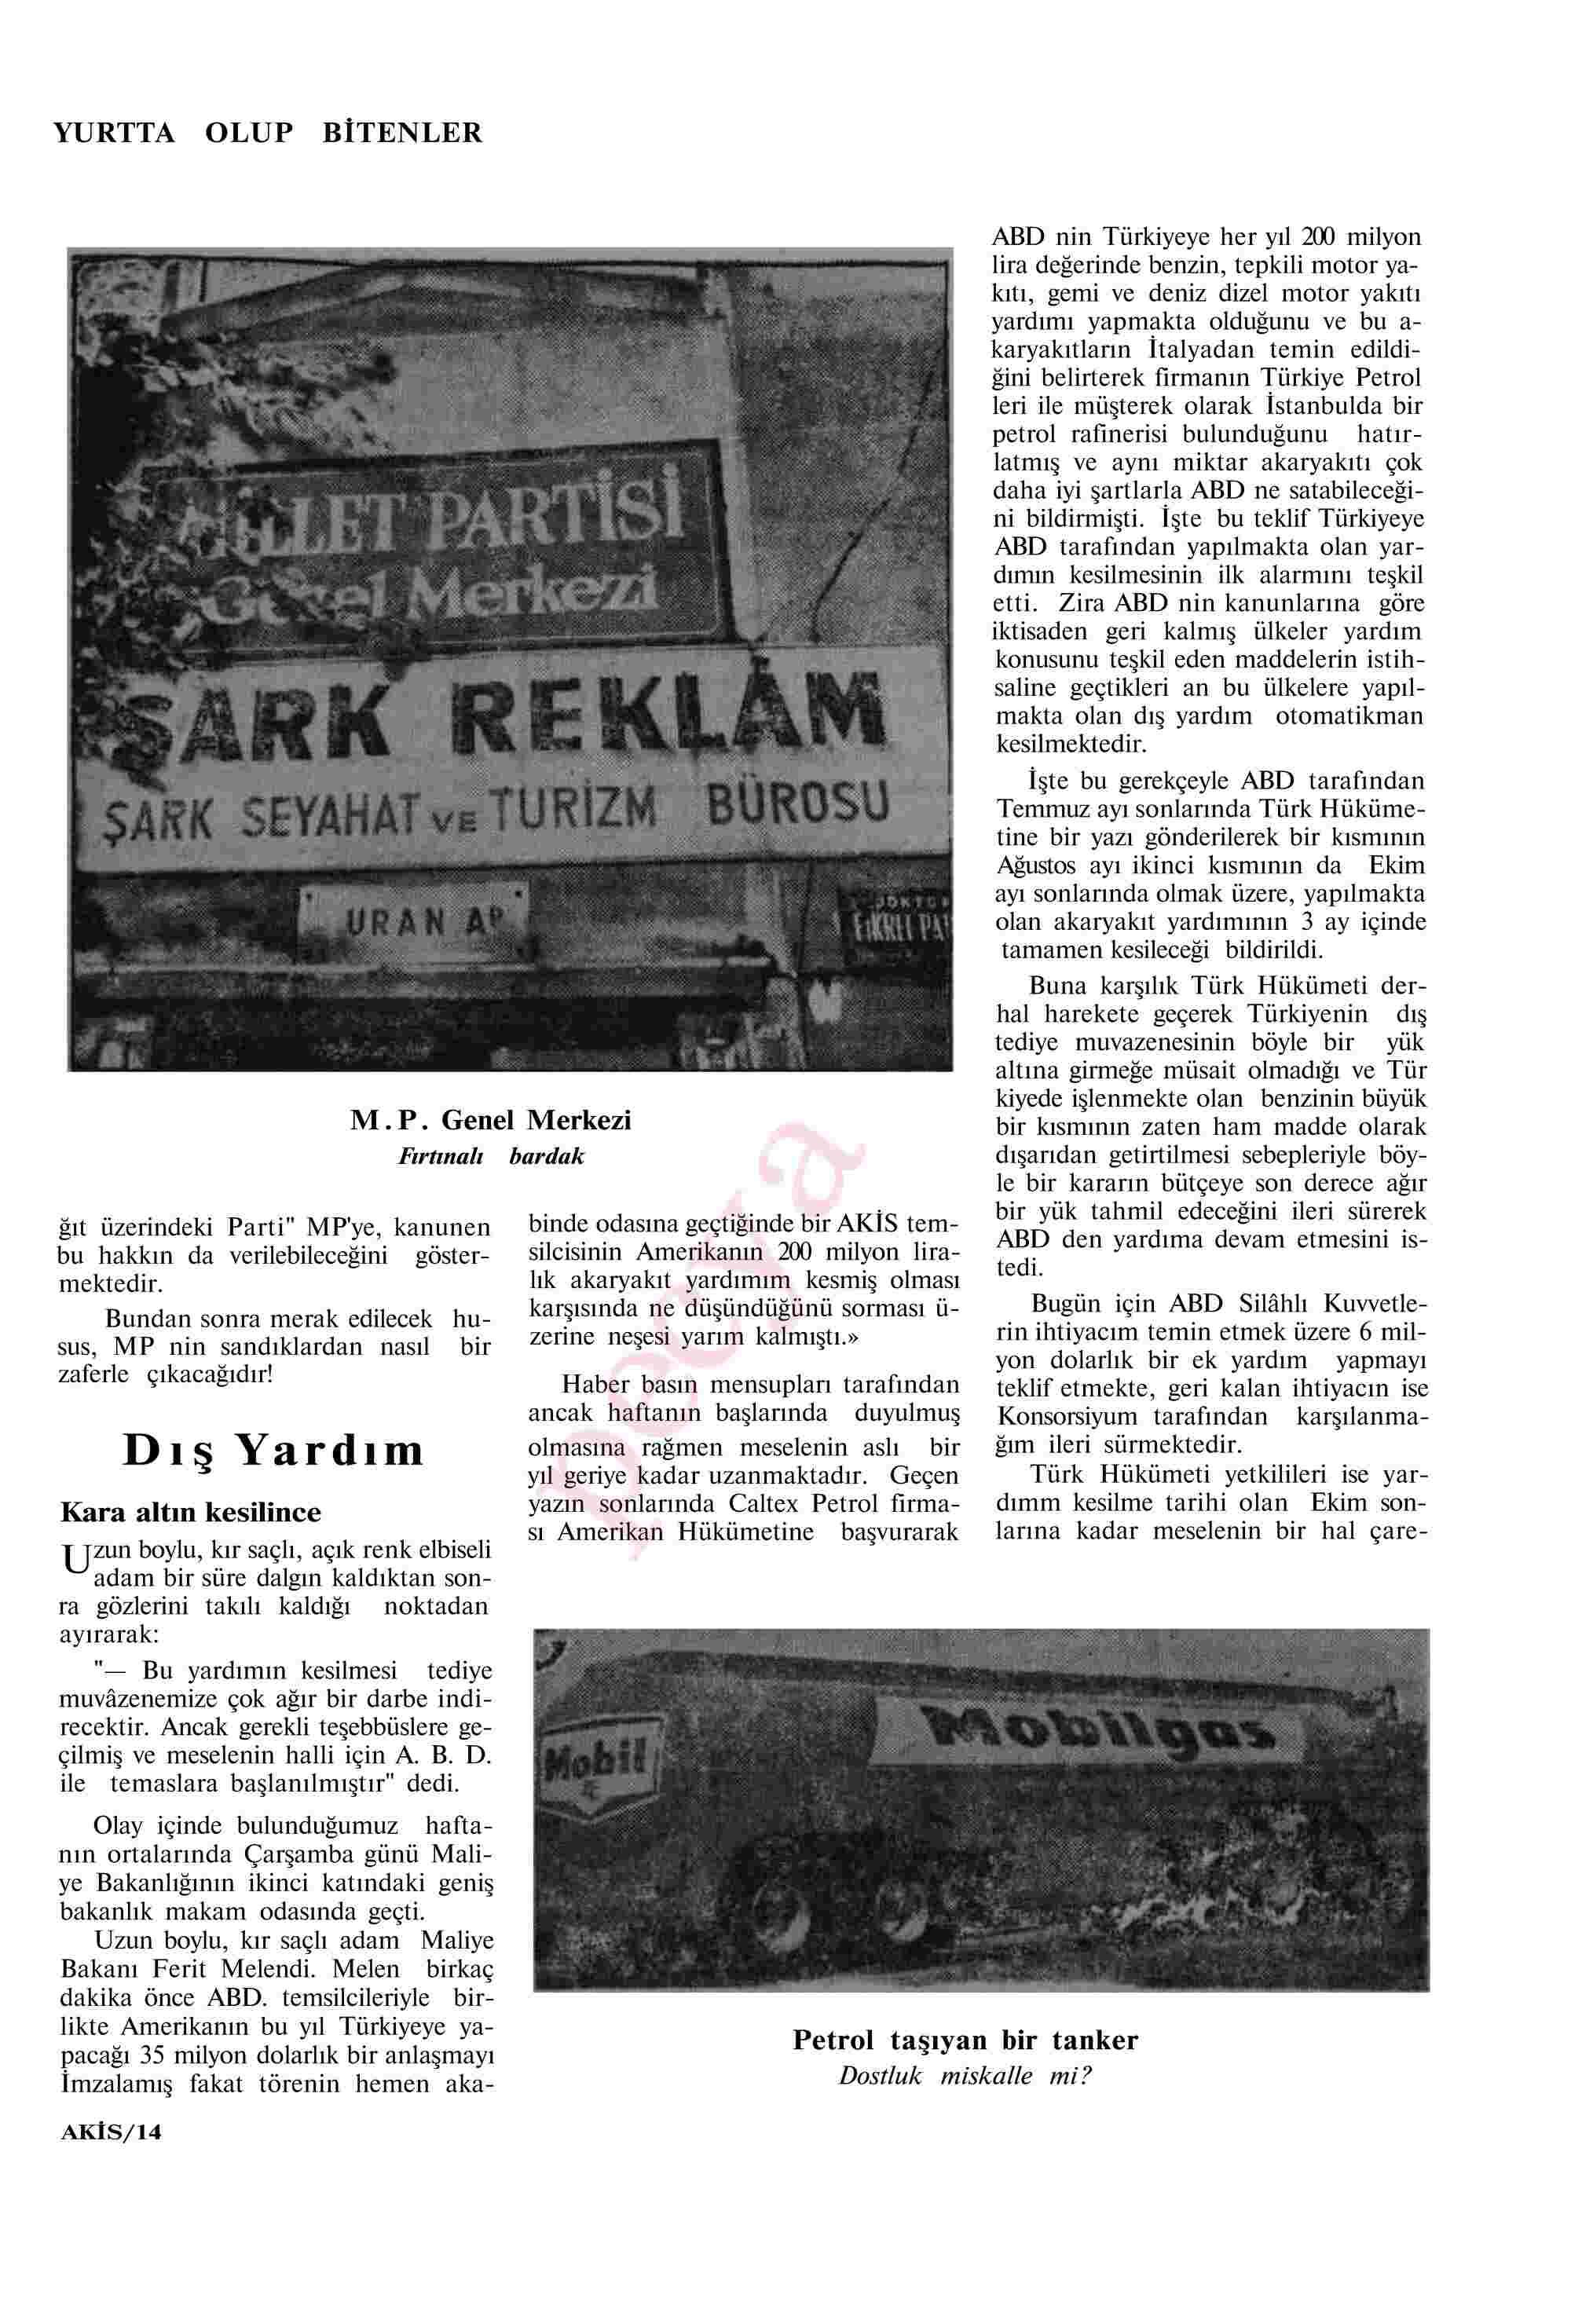 14 Eylül 1963 Tarihli Akis Dergisi Sayfa 14